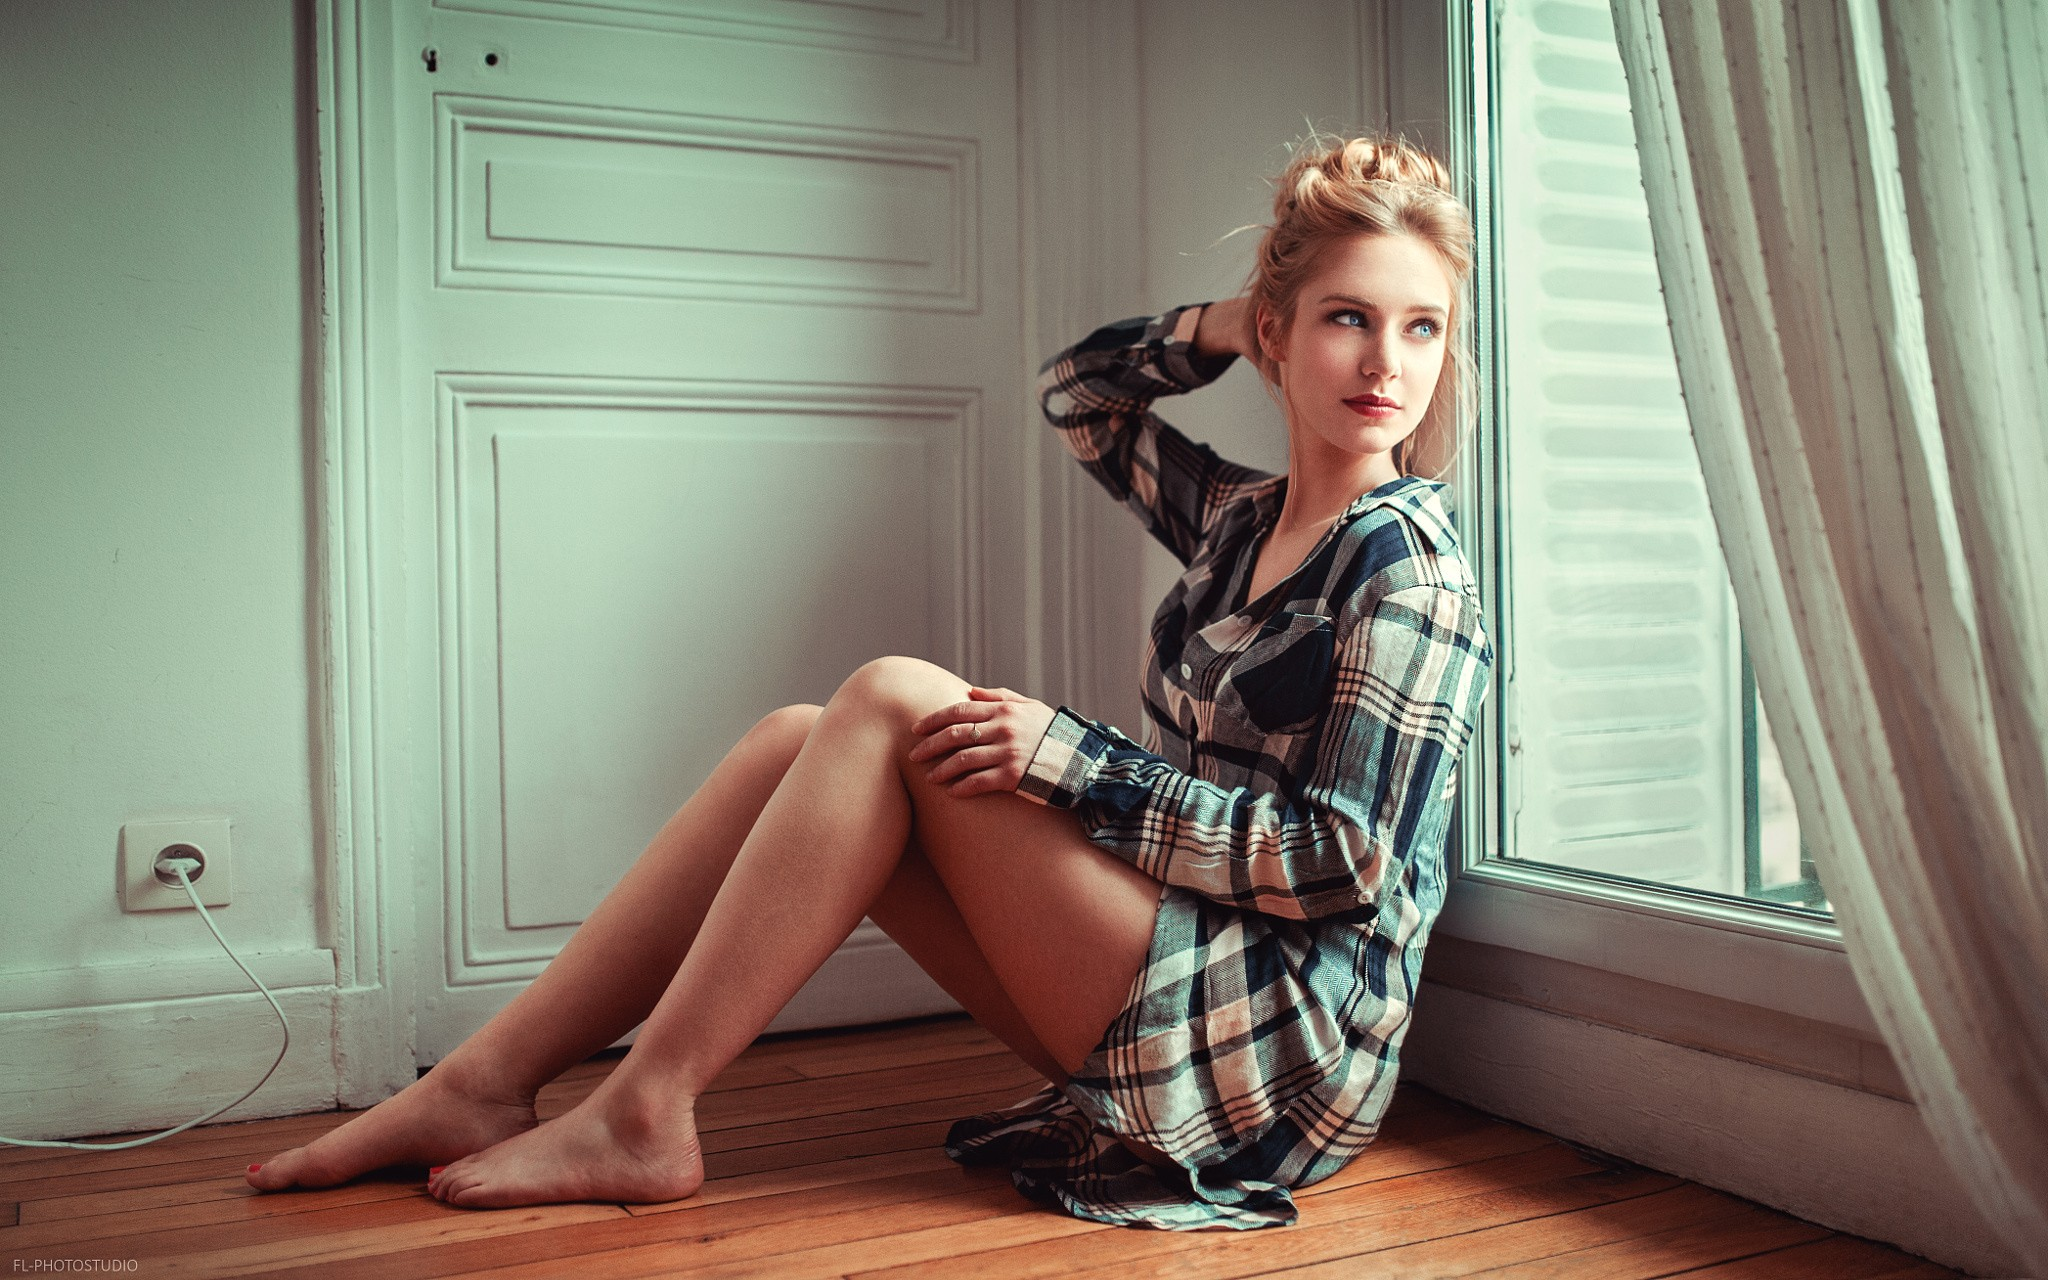 People 2048x1280 women blonde shirt blue eyes legs feet red nails sitting on the floor window Lods Franck Eva Mikulski barefoot looking out window